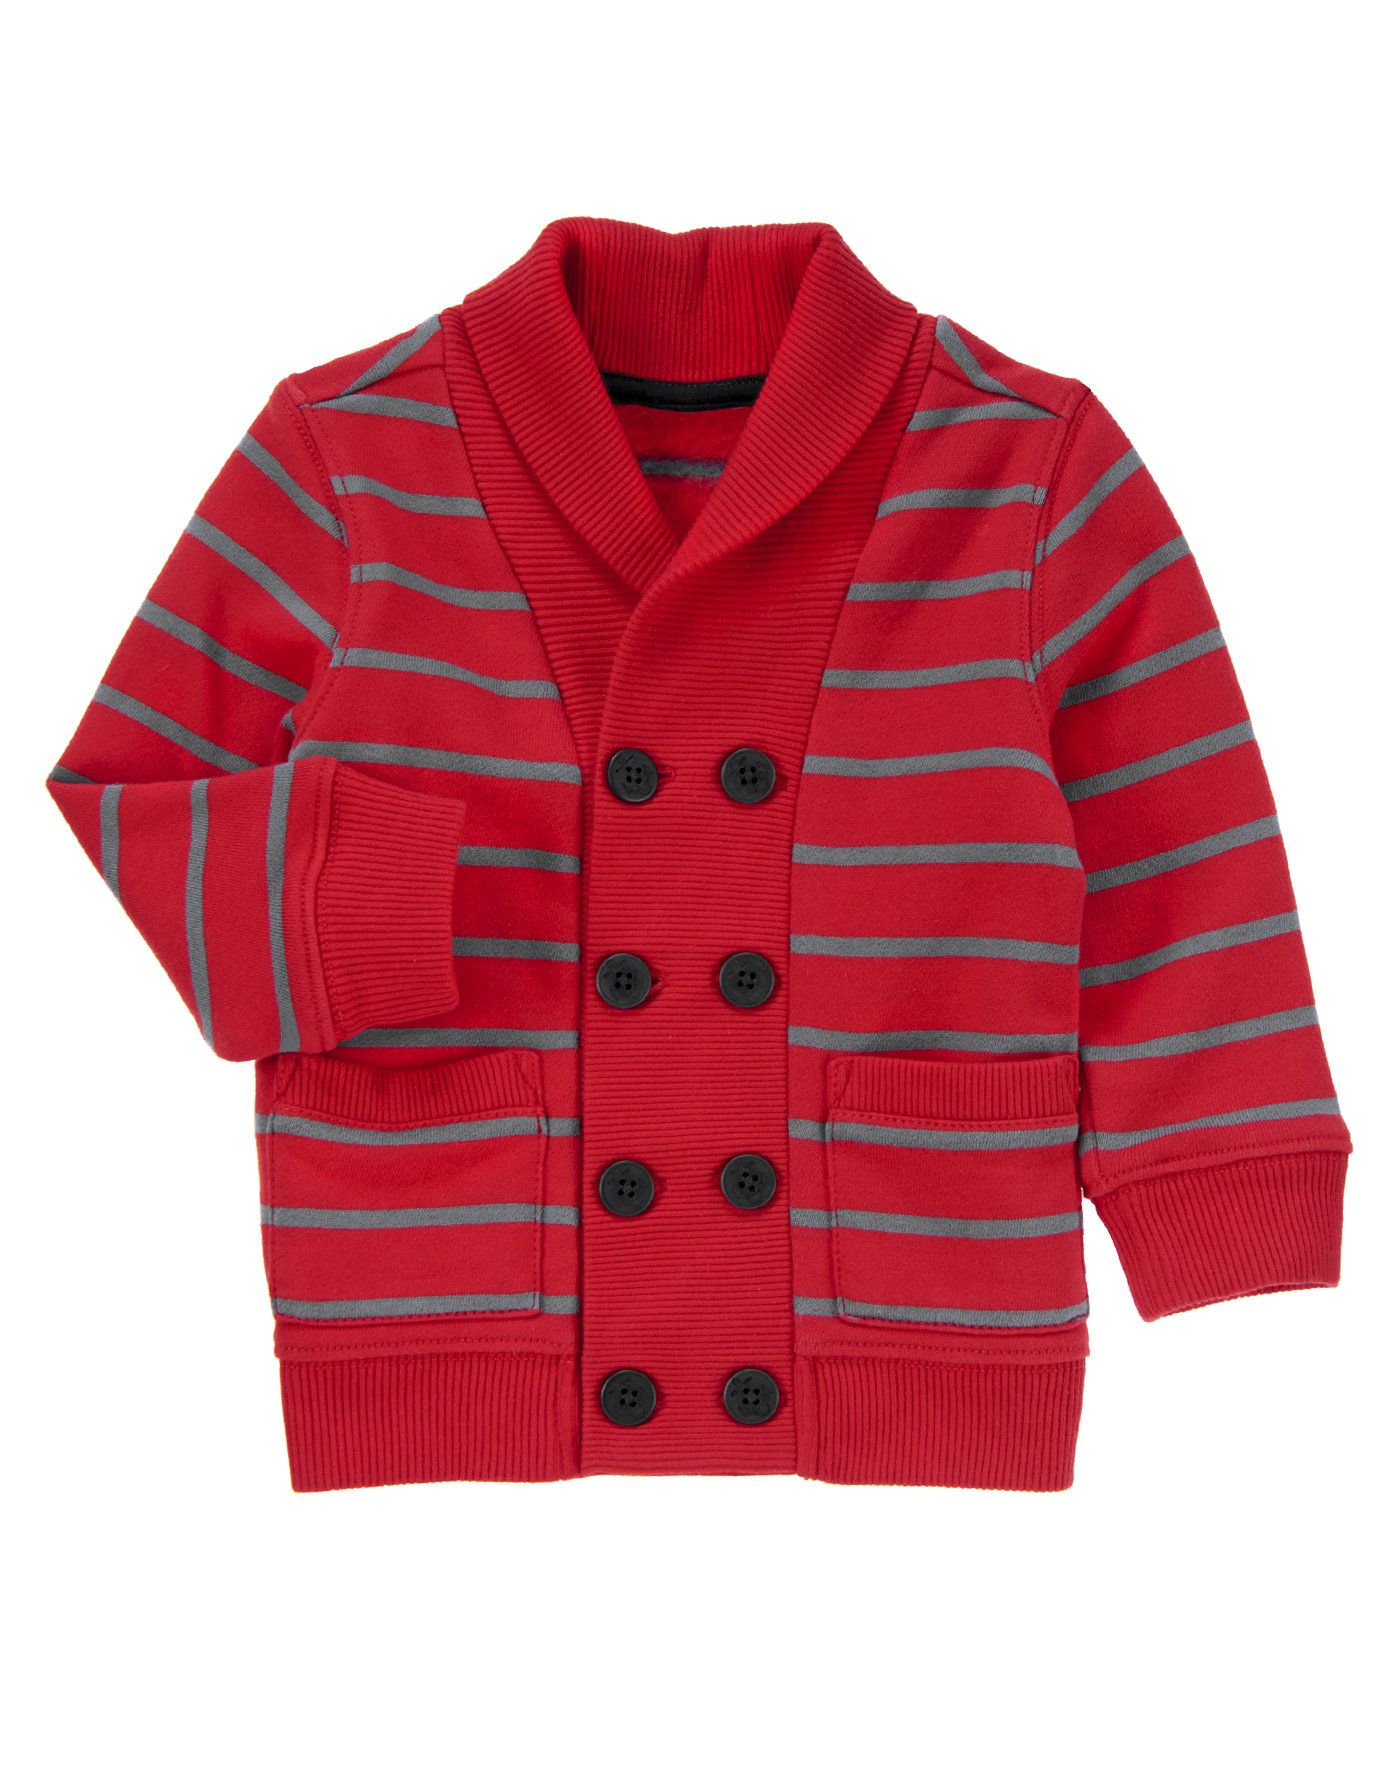 Shawl Collar Fleece Cardigan | Babies clothes and Babies